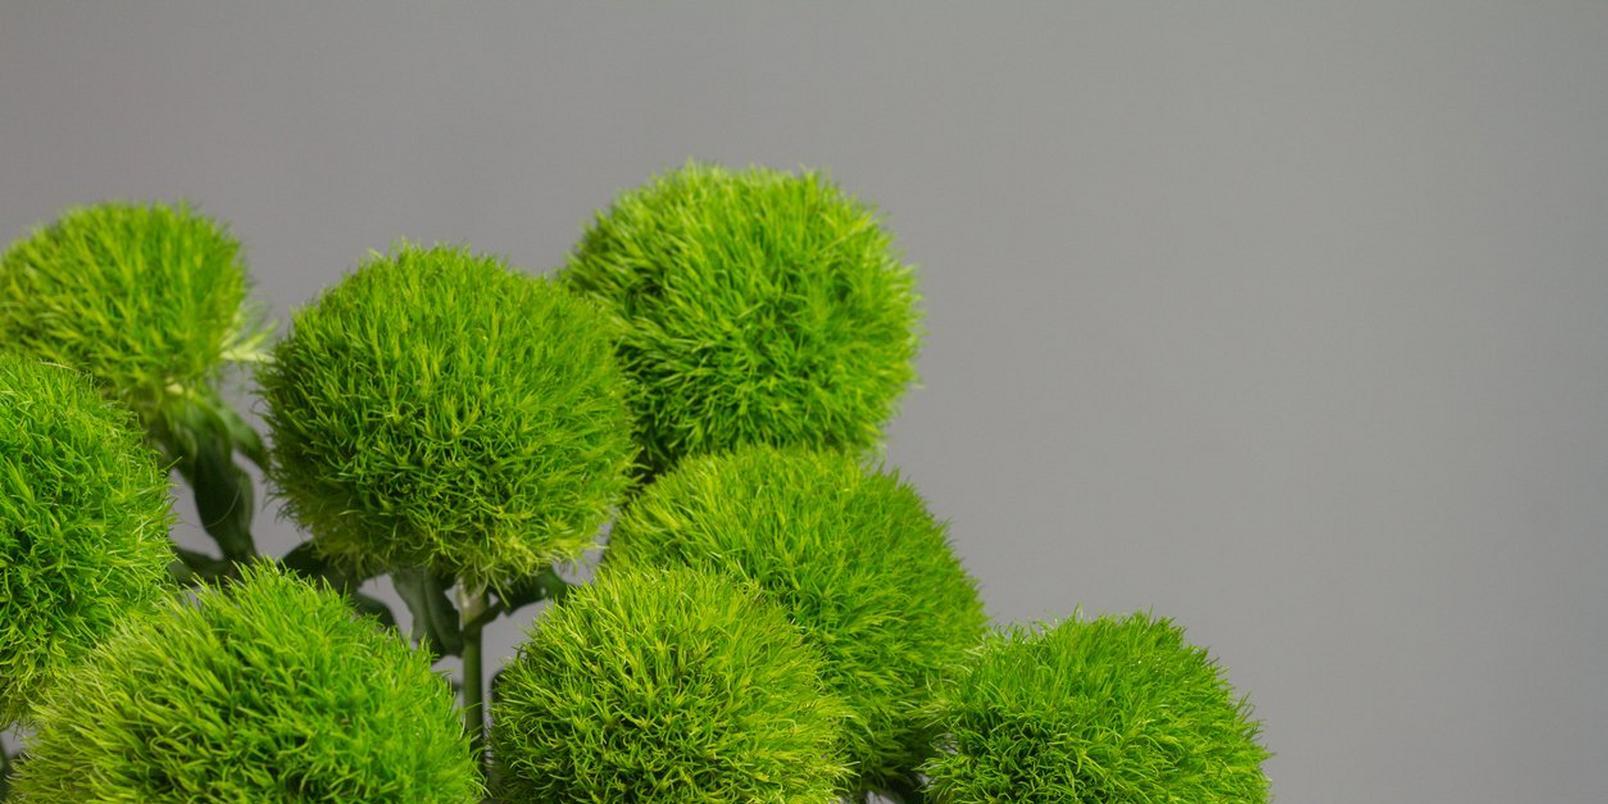 iStock-1253930156-green-dianthus